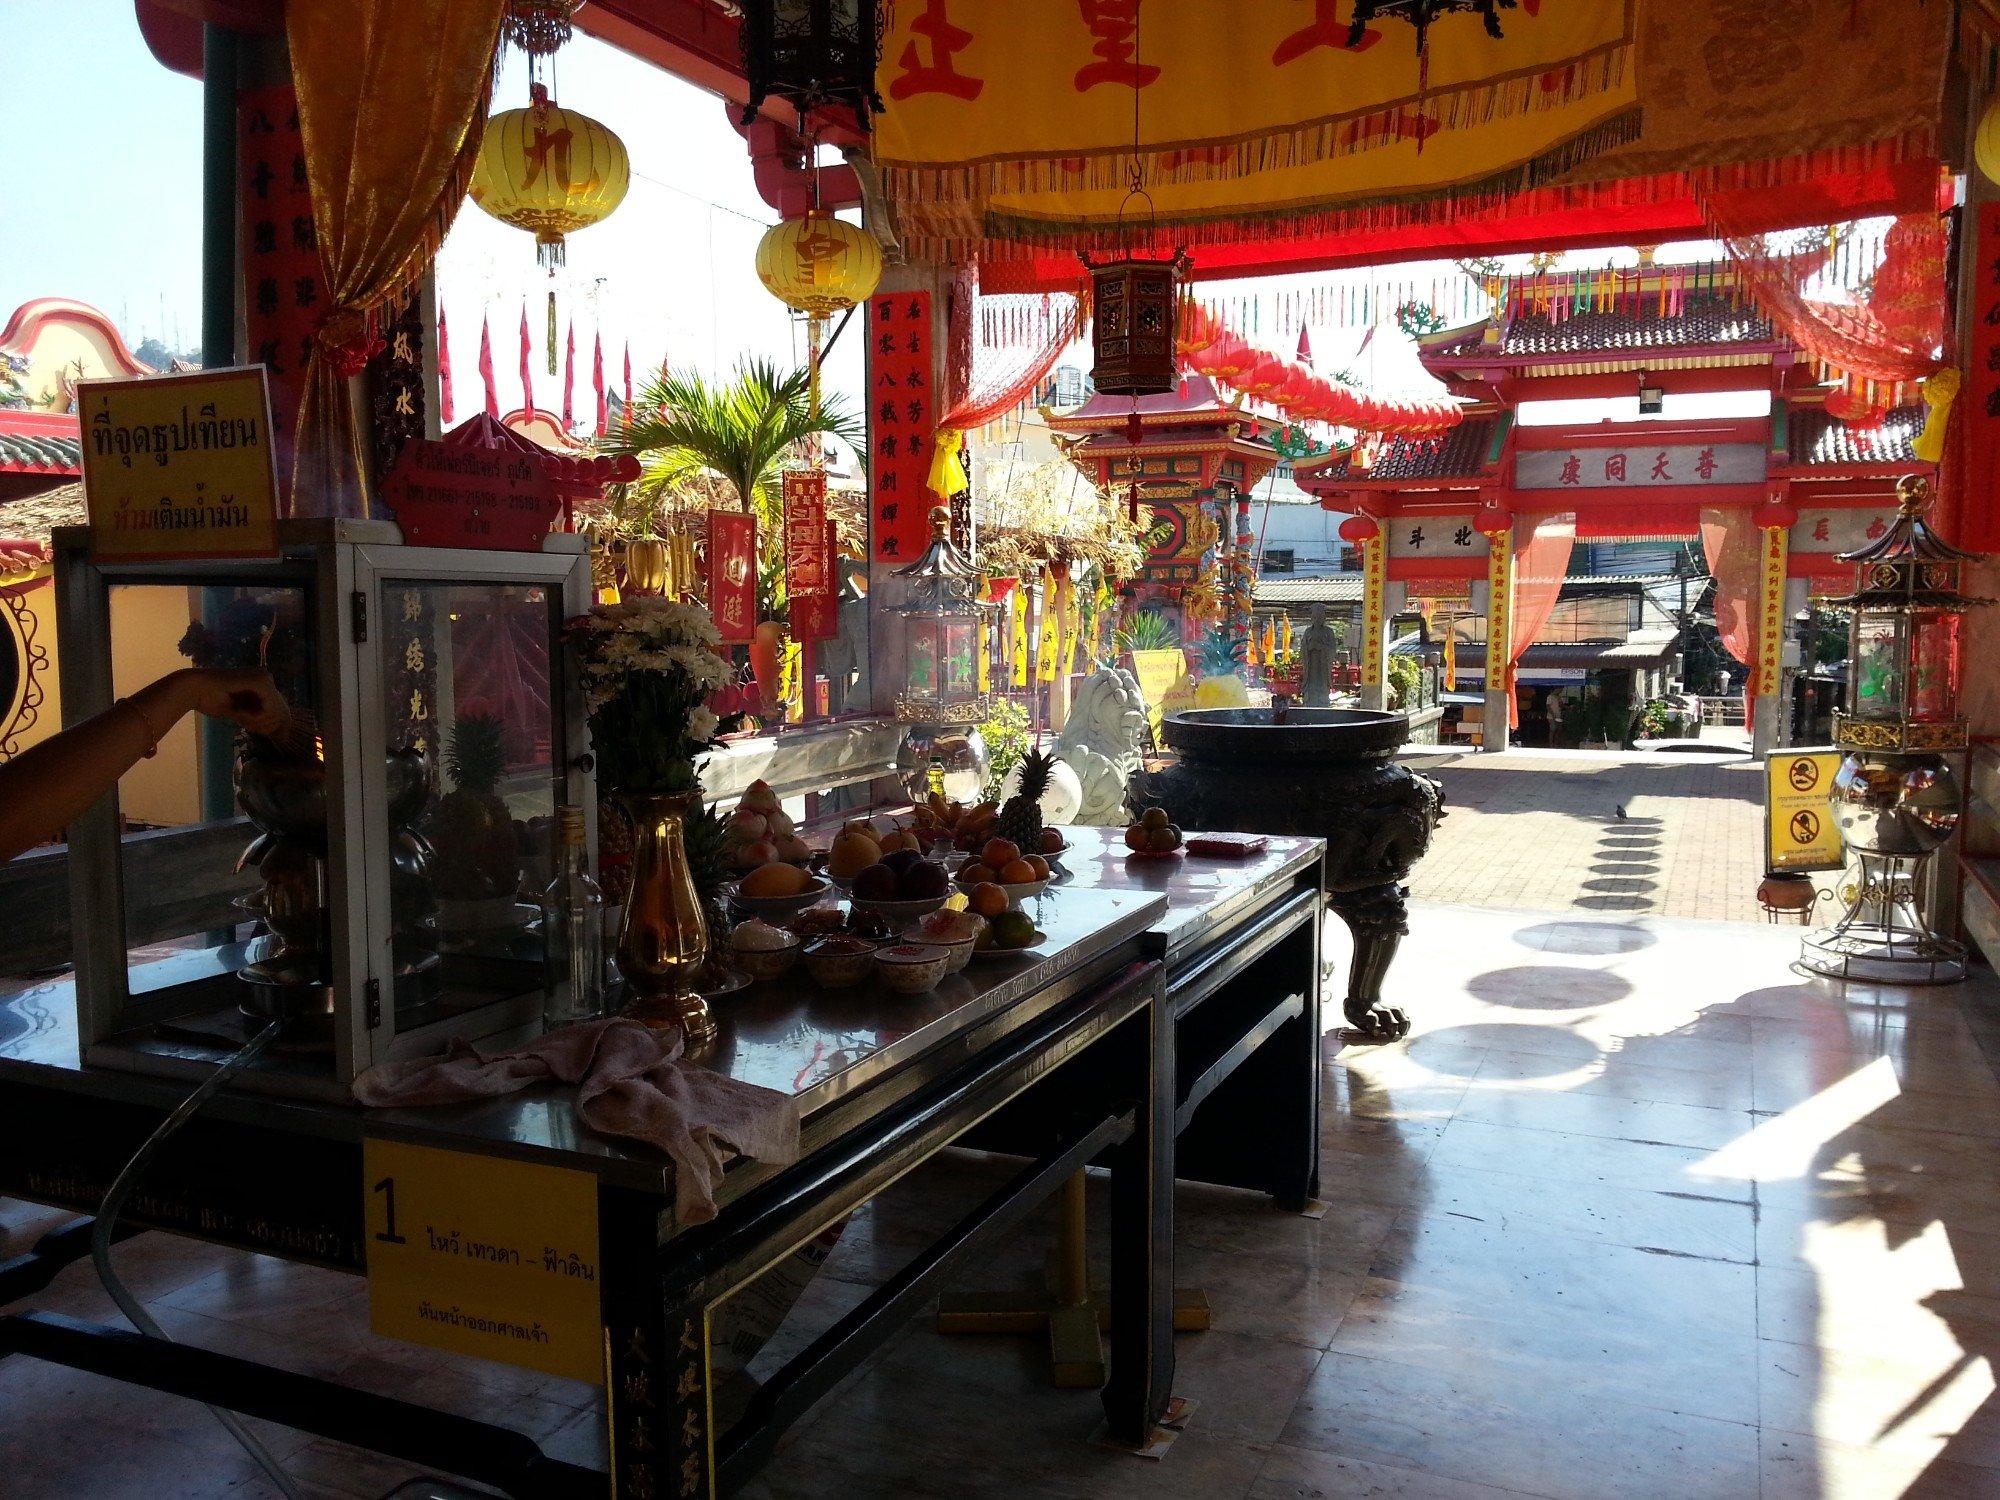 Incense burner at the Jui Tui Shrine